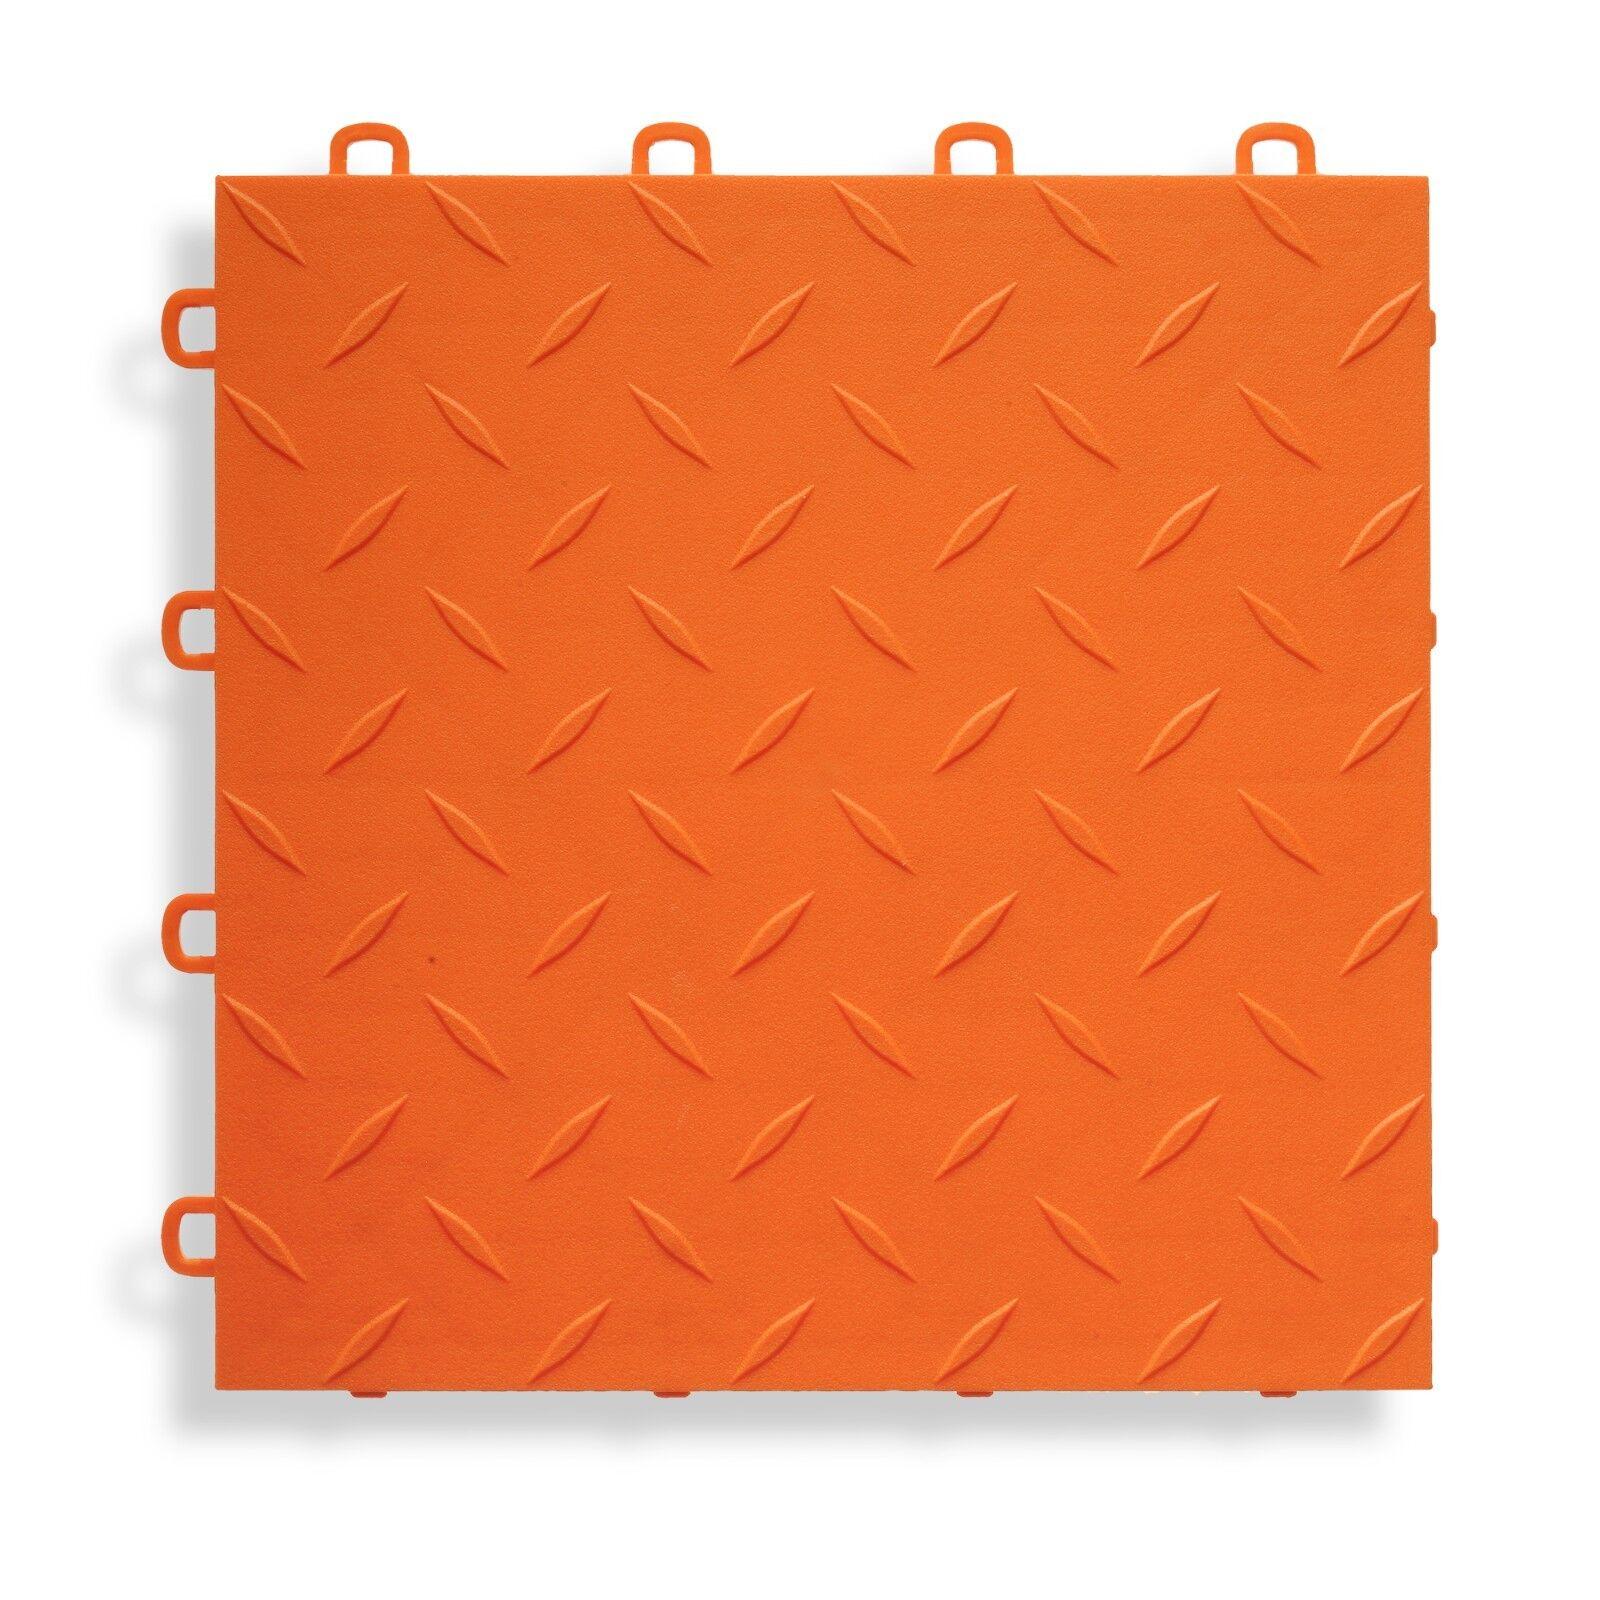 Garage Floor Paint Substitute Diamond Orange Usa Made Ebay